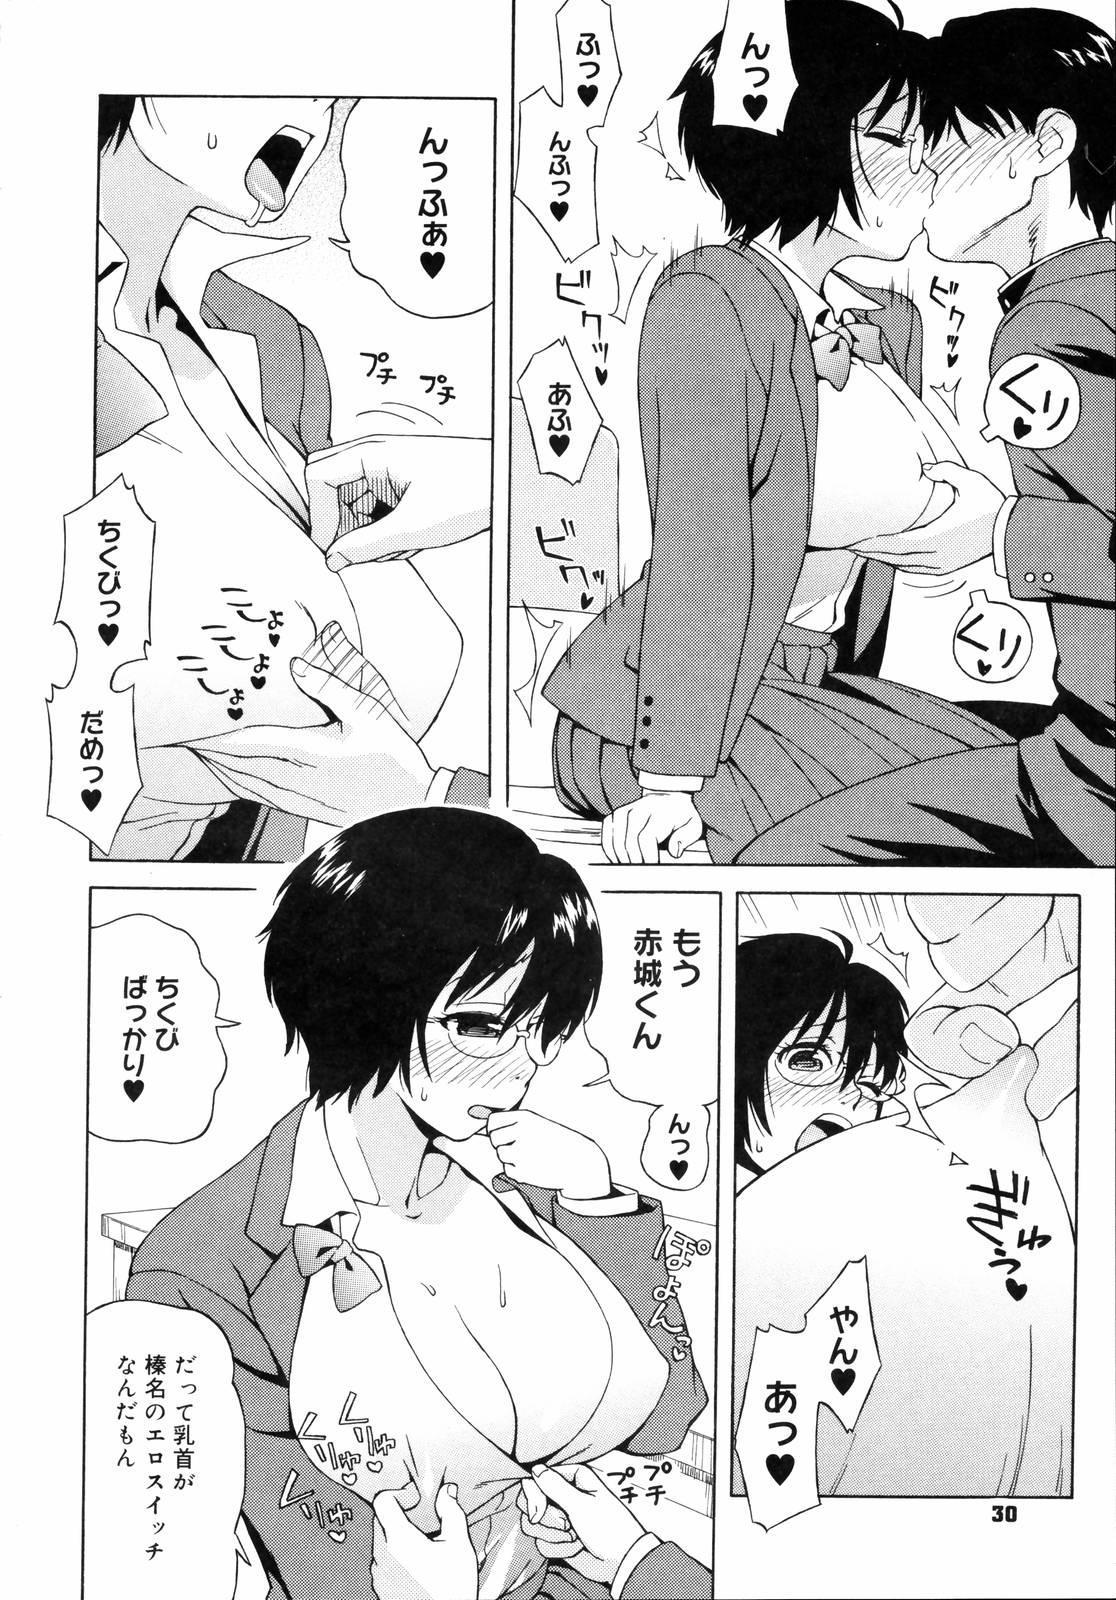 Shishunki wa Hatsujouki - Adolescence is a sexual excitement period. 31